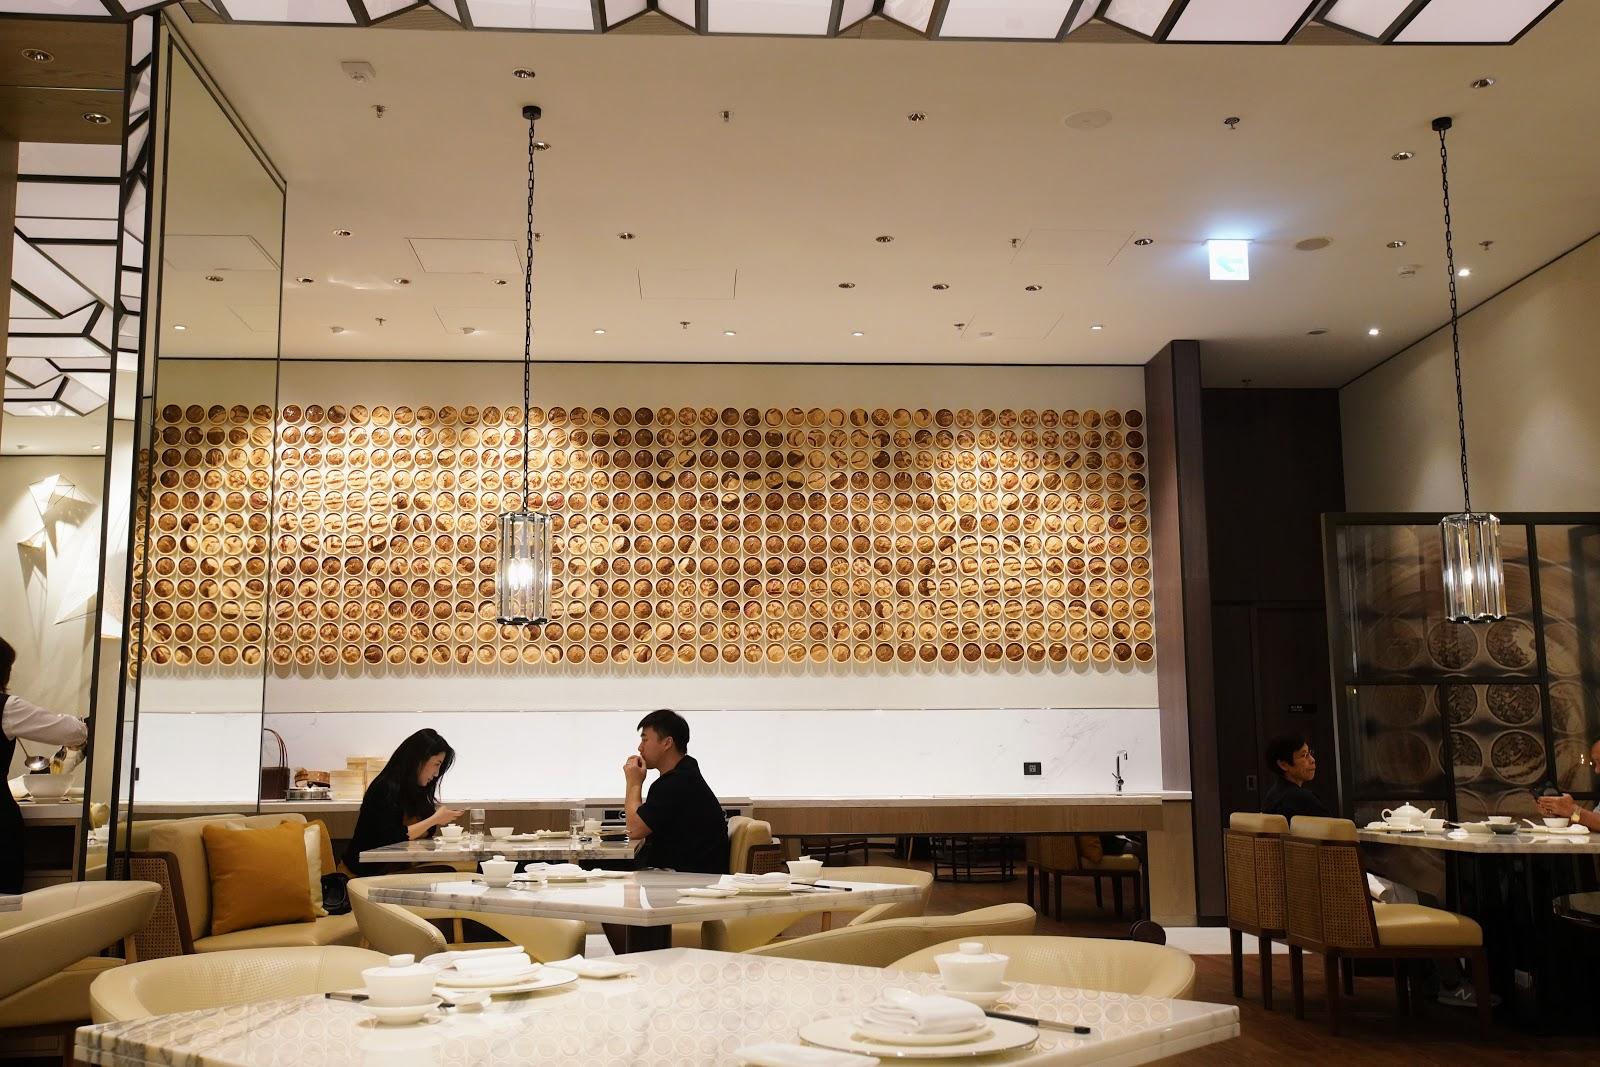 住宿|台北士林萬麗酒店 Renaissance Taipei Shihlin Hotel 萬麗軒